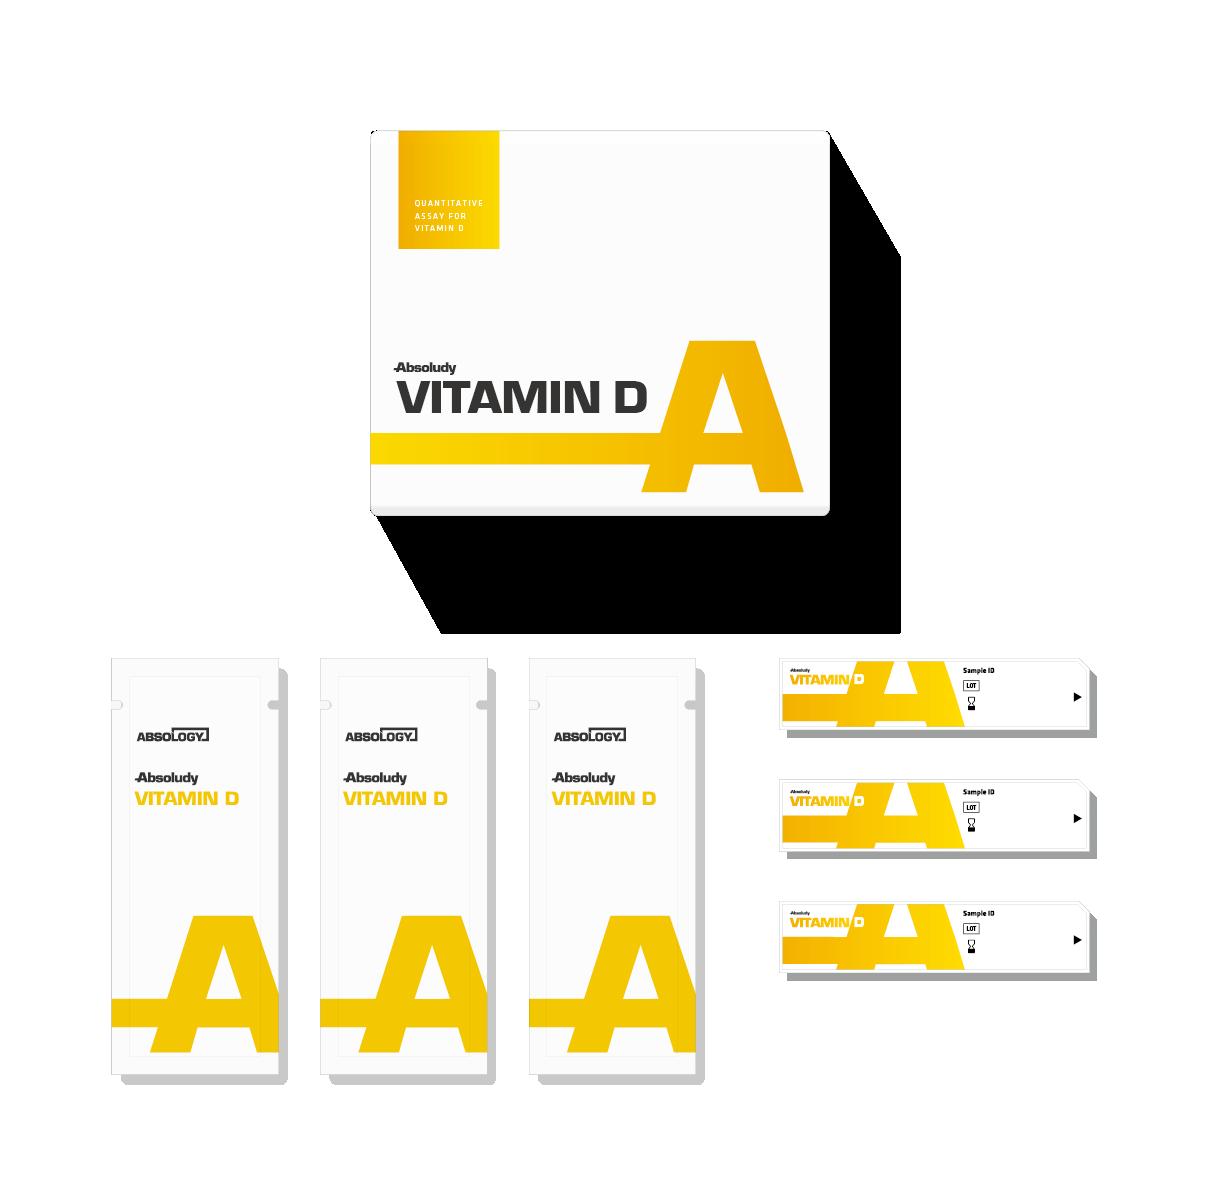 Absoludy Vitamin D